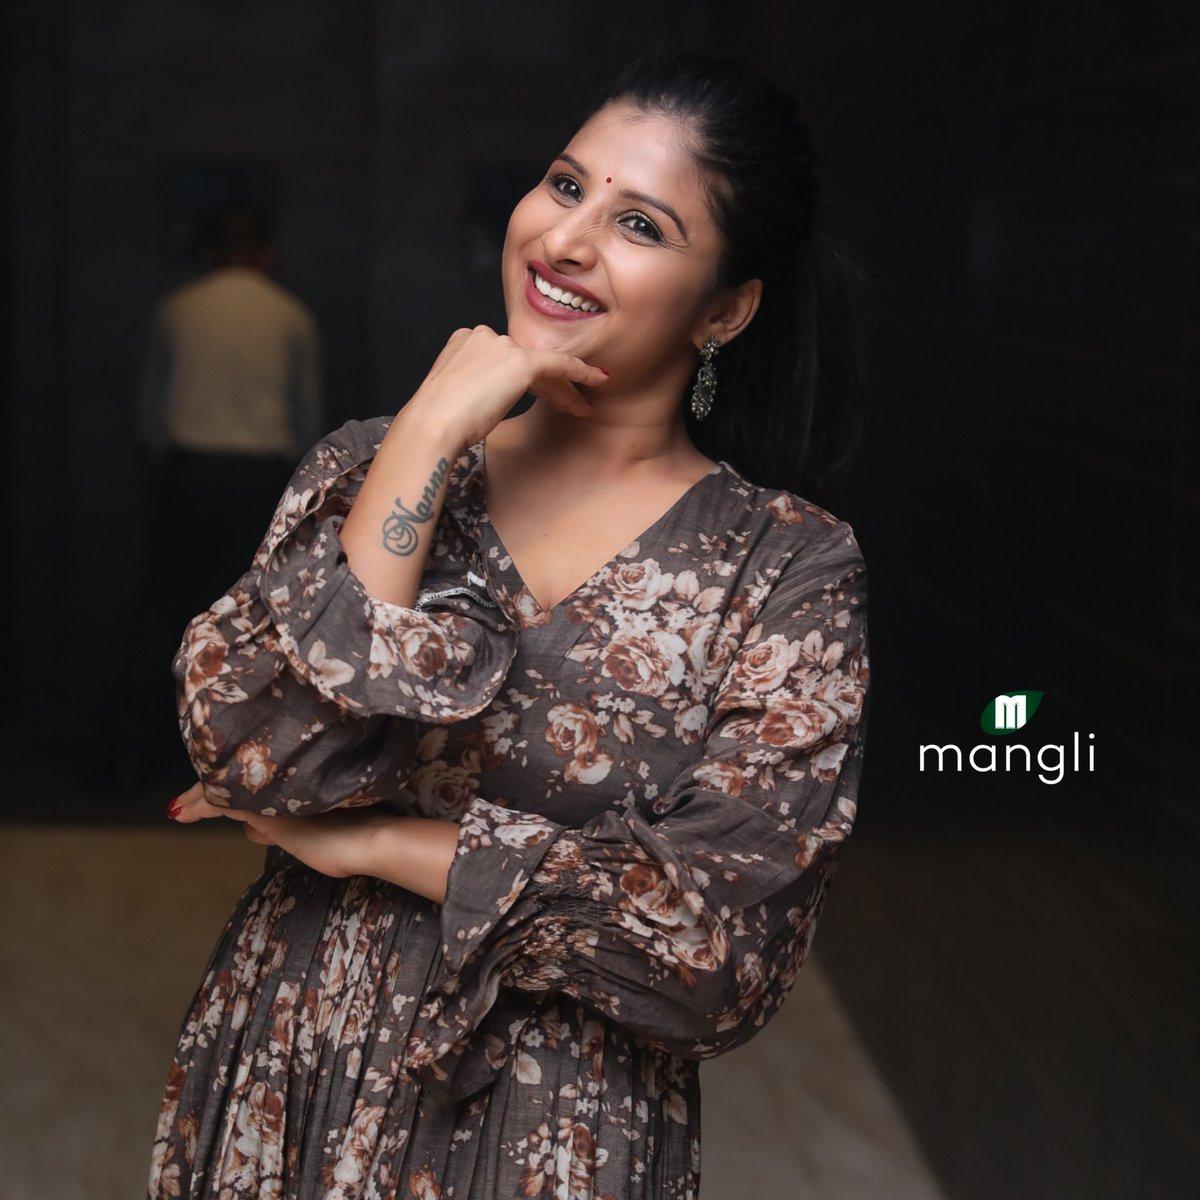 Be kind 🦋 whenever possible 💖 . . Outfit @viba.studio Styling @workofelan Pic @ganeshpeddireddy Retouch @aretty_ram_naresh_0608 . . #stylingtalesbyjyo #stylingbyshirisha  #Mangli  #Telangana  #AndhraPradesh  #FolkQueen #TelanganaSongs  #janapadam #India  #Fashion #Beauty #queen